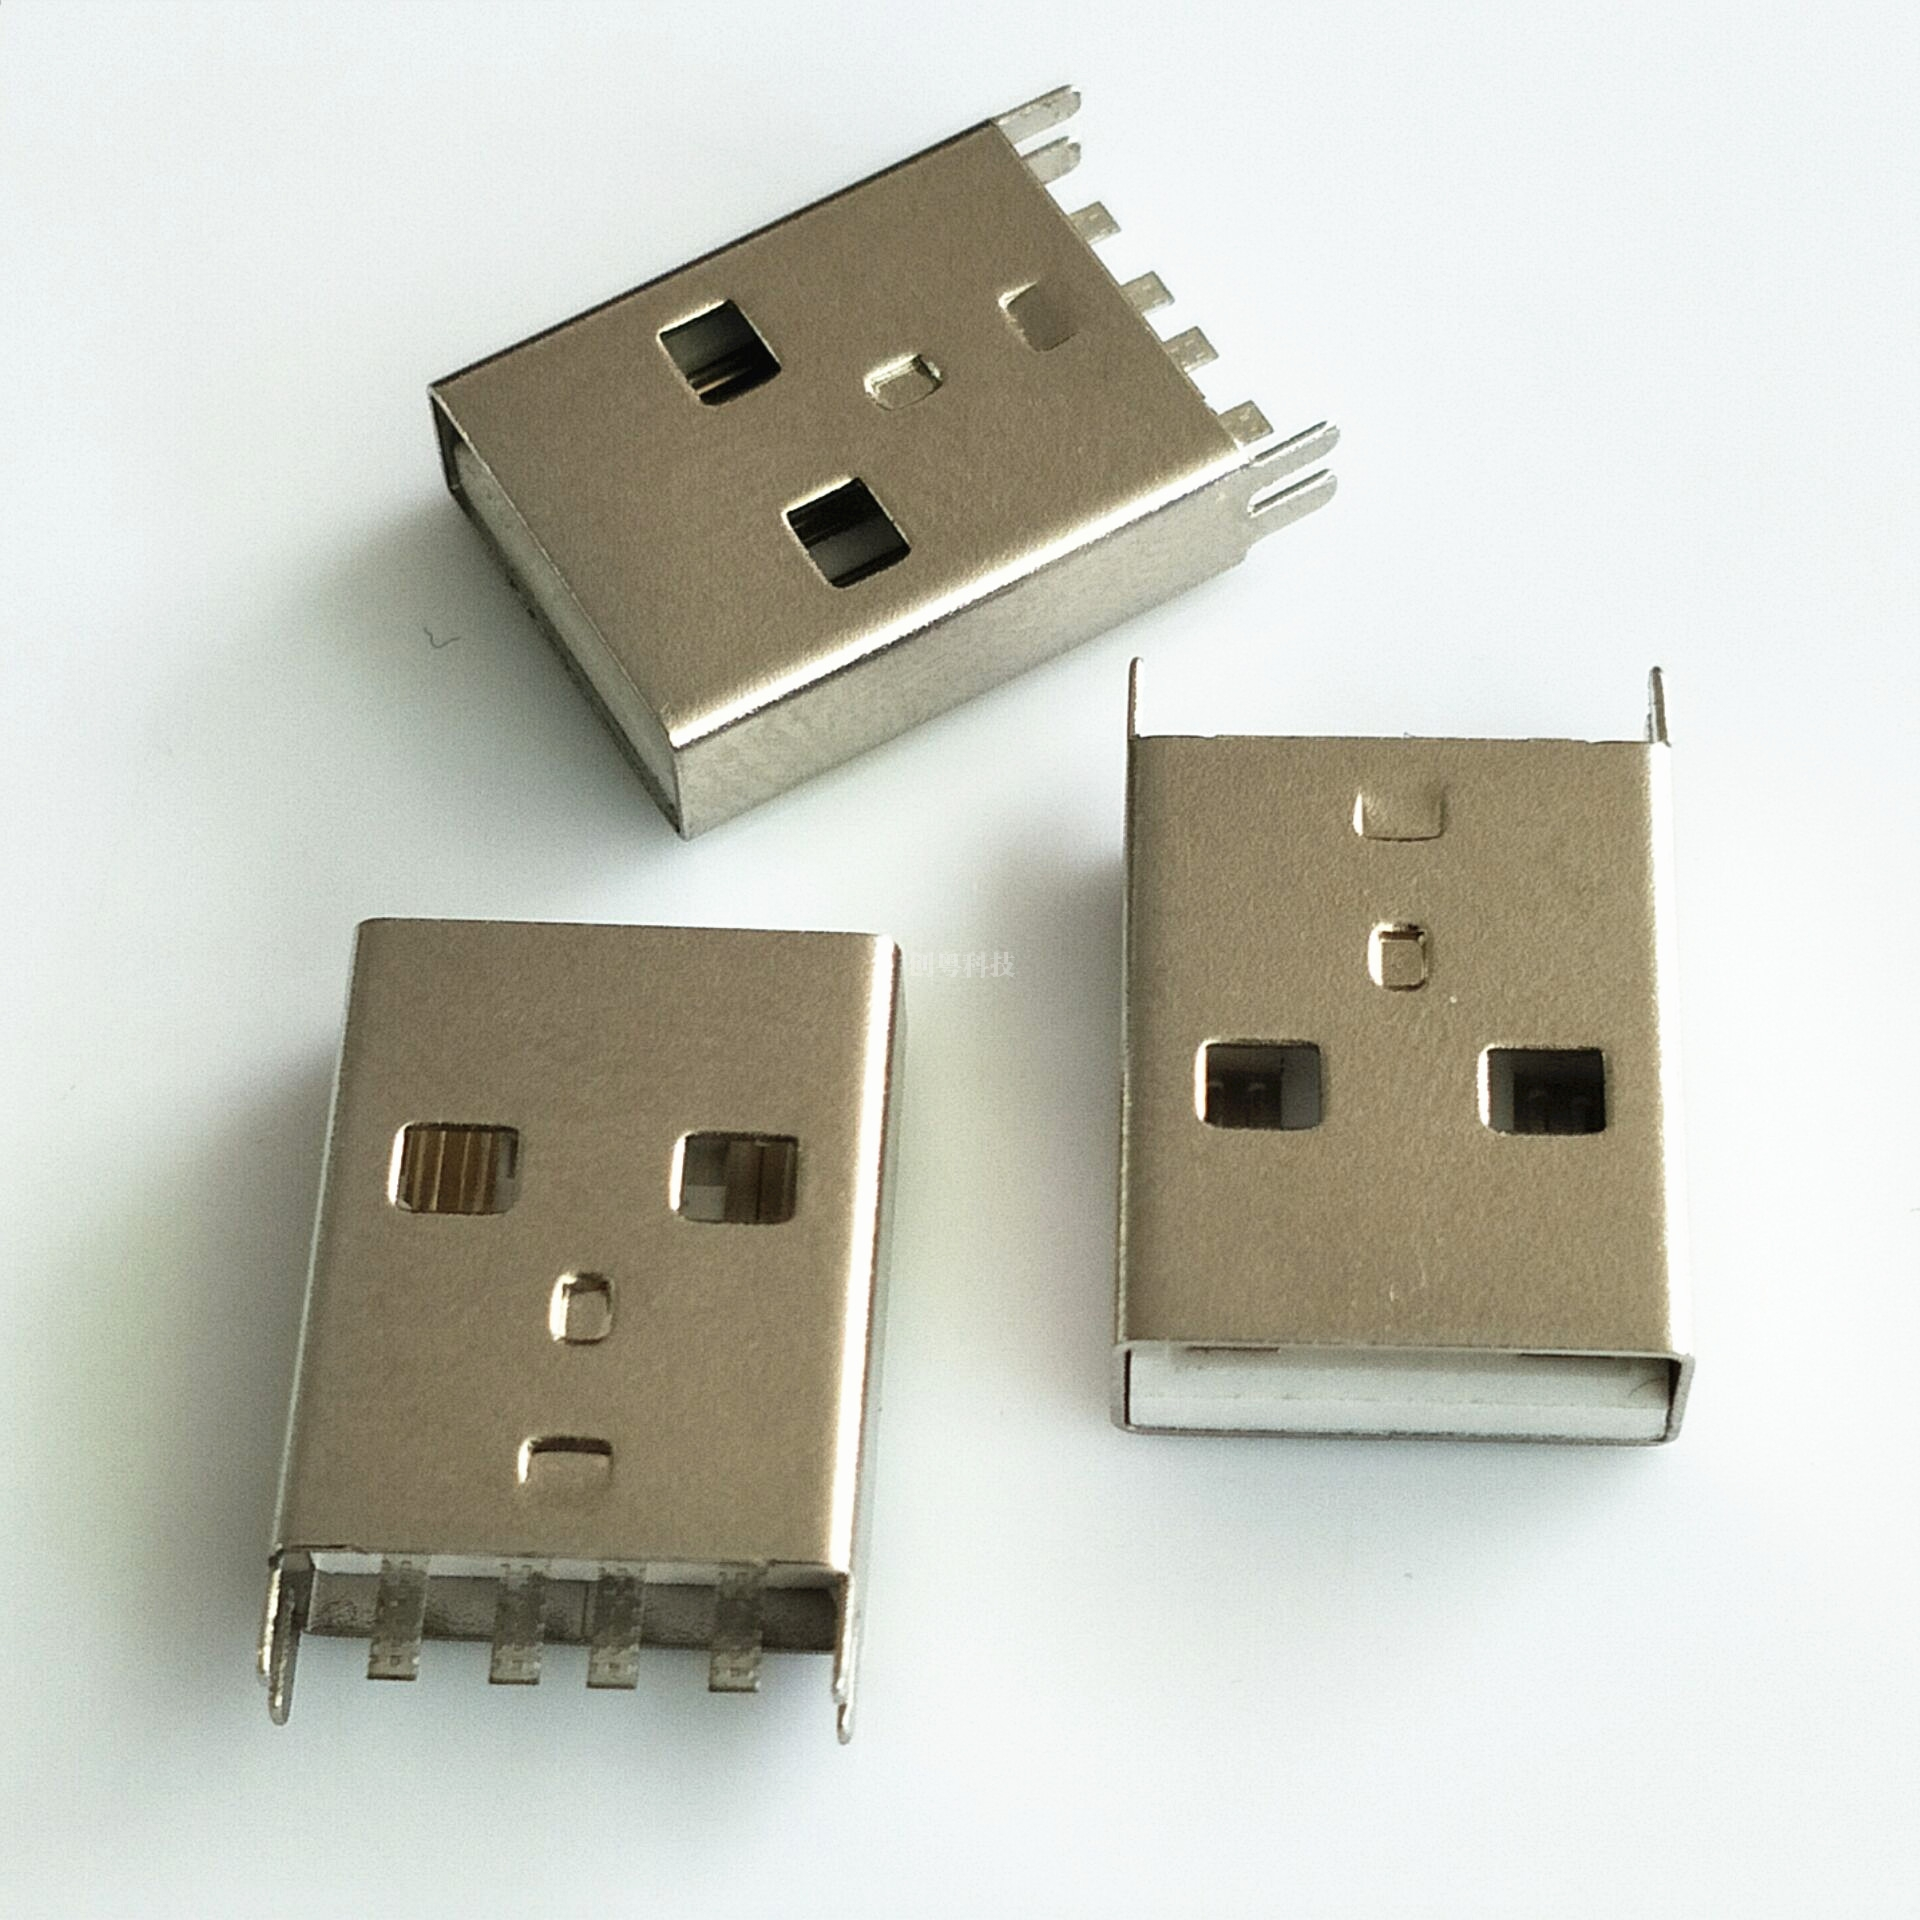 USB 夹板公头